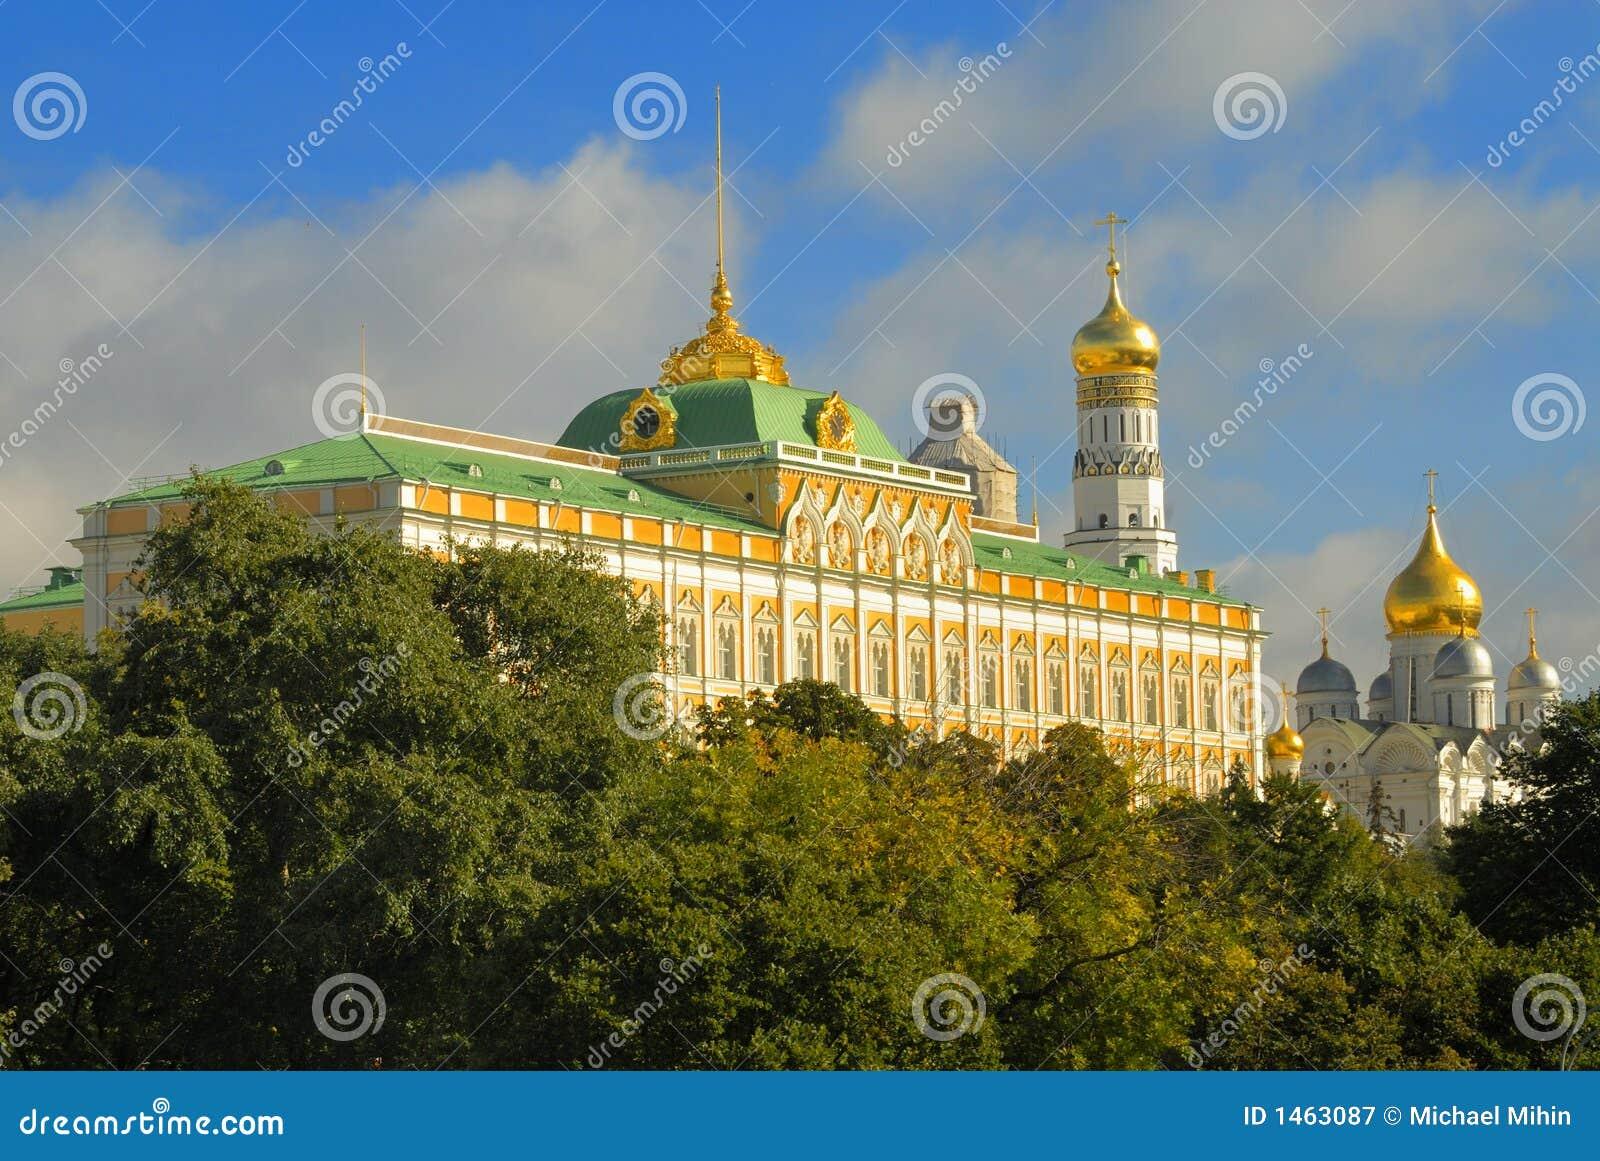 O Kremlin em Moscovo, Rússia